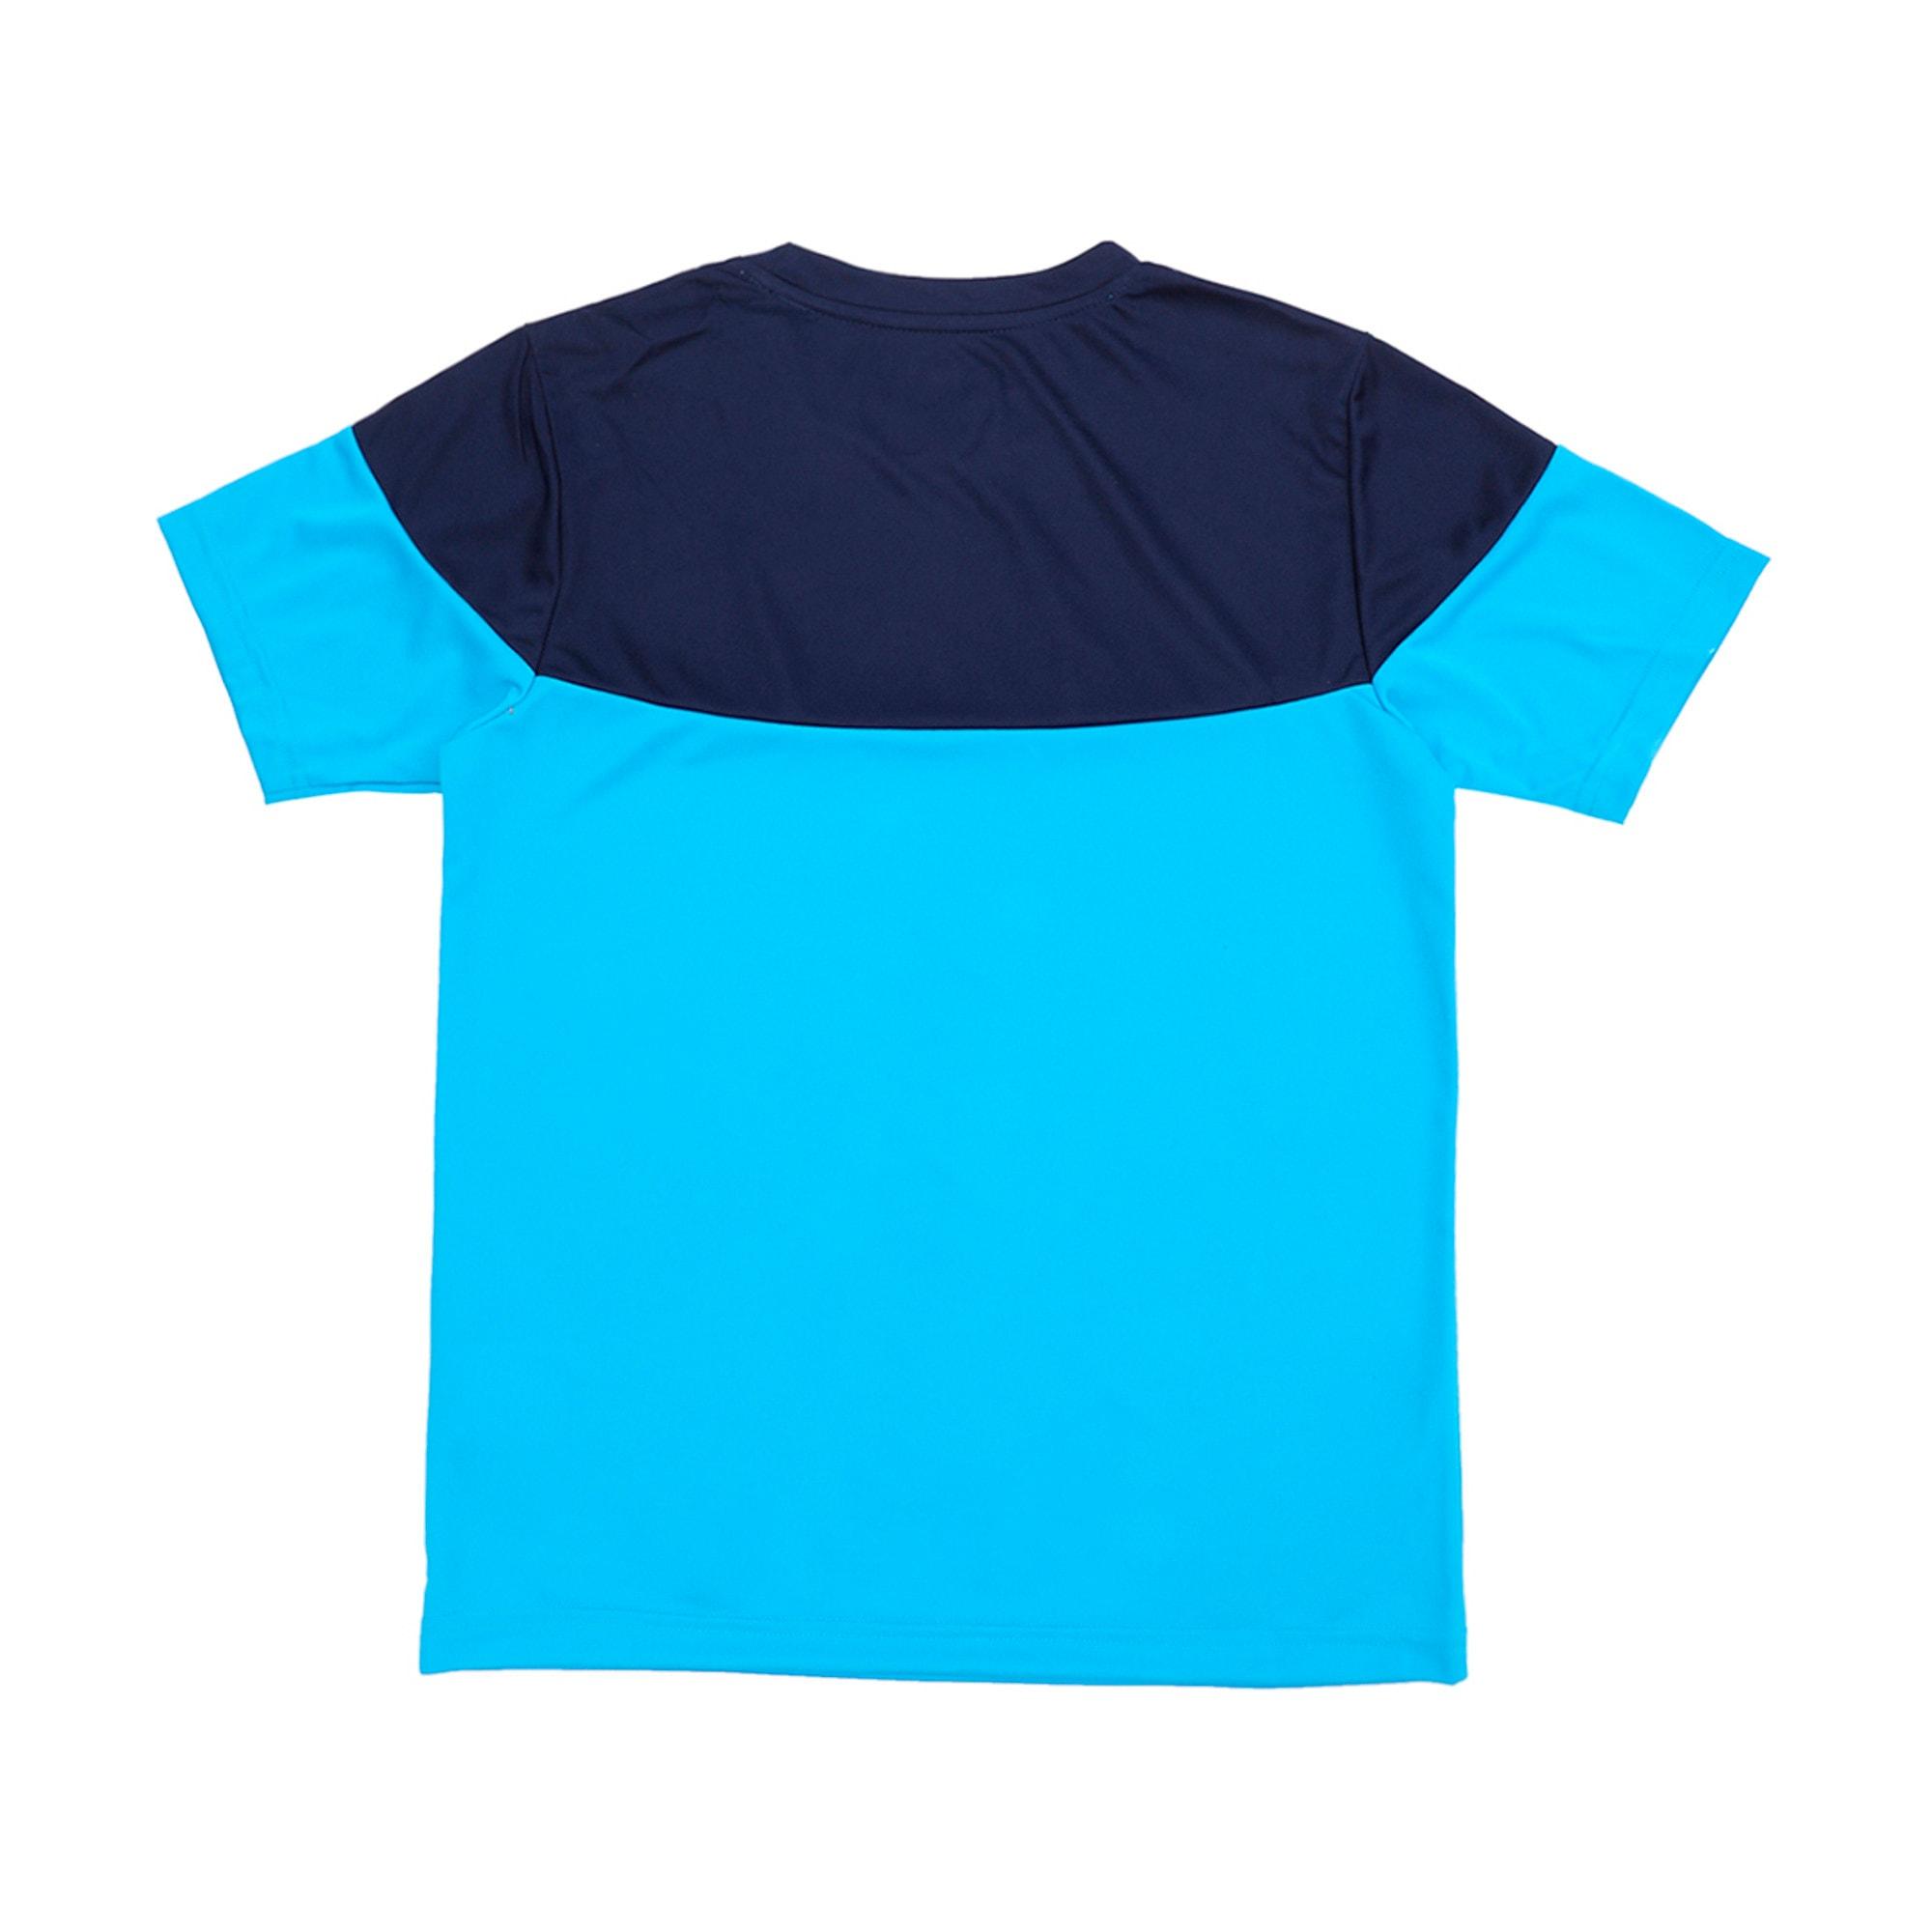 Thumbnail 3 of ftblPLAY Kids' Shirt, Bleu Azur-Peacoat, medium-IND